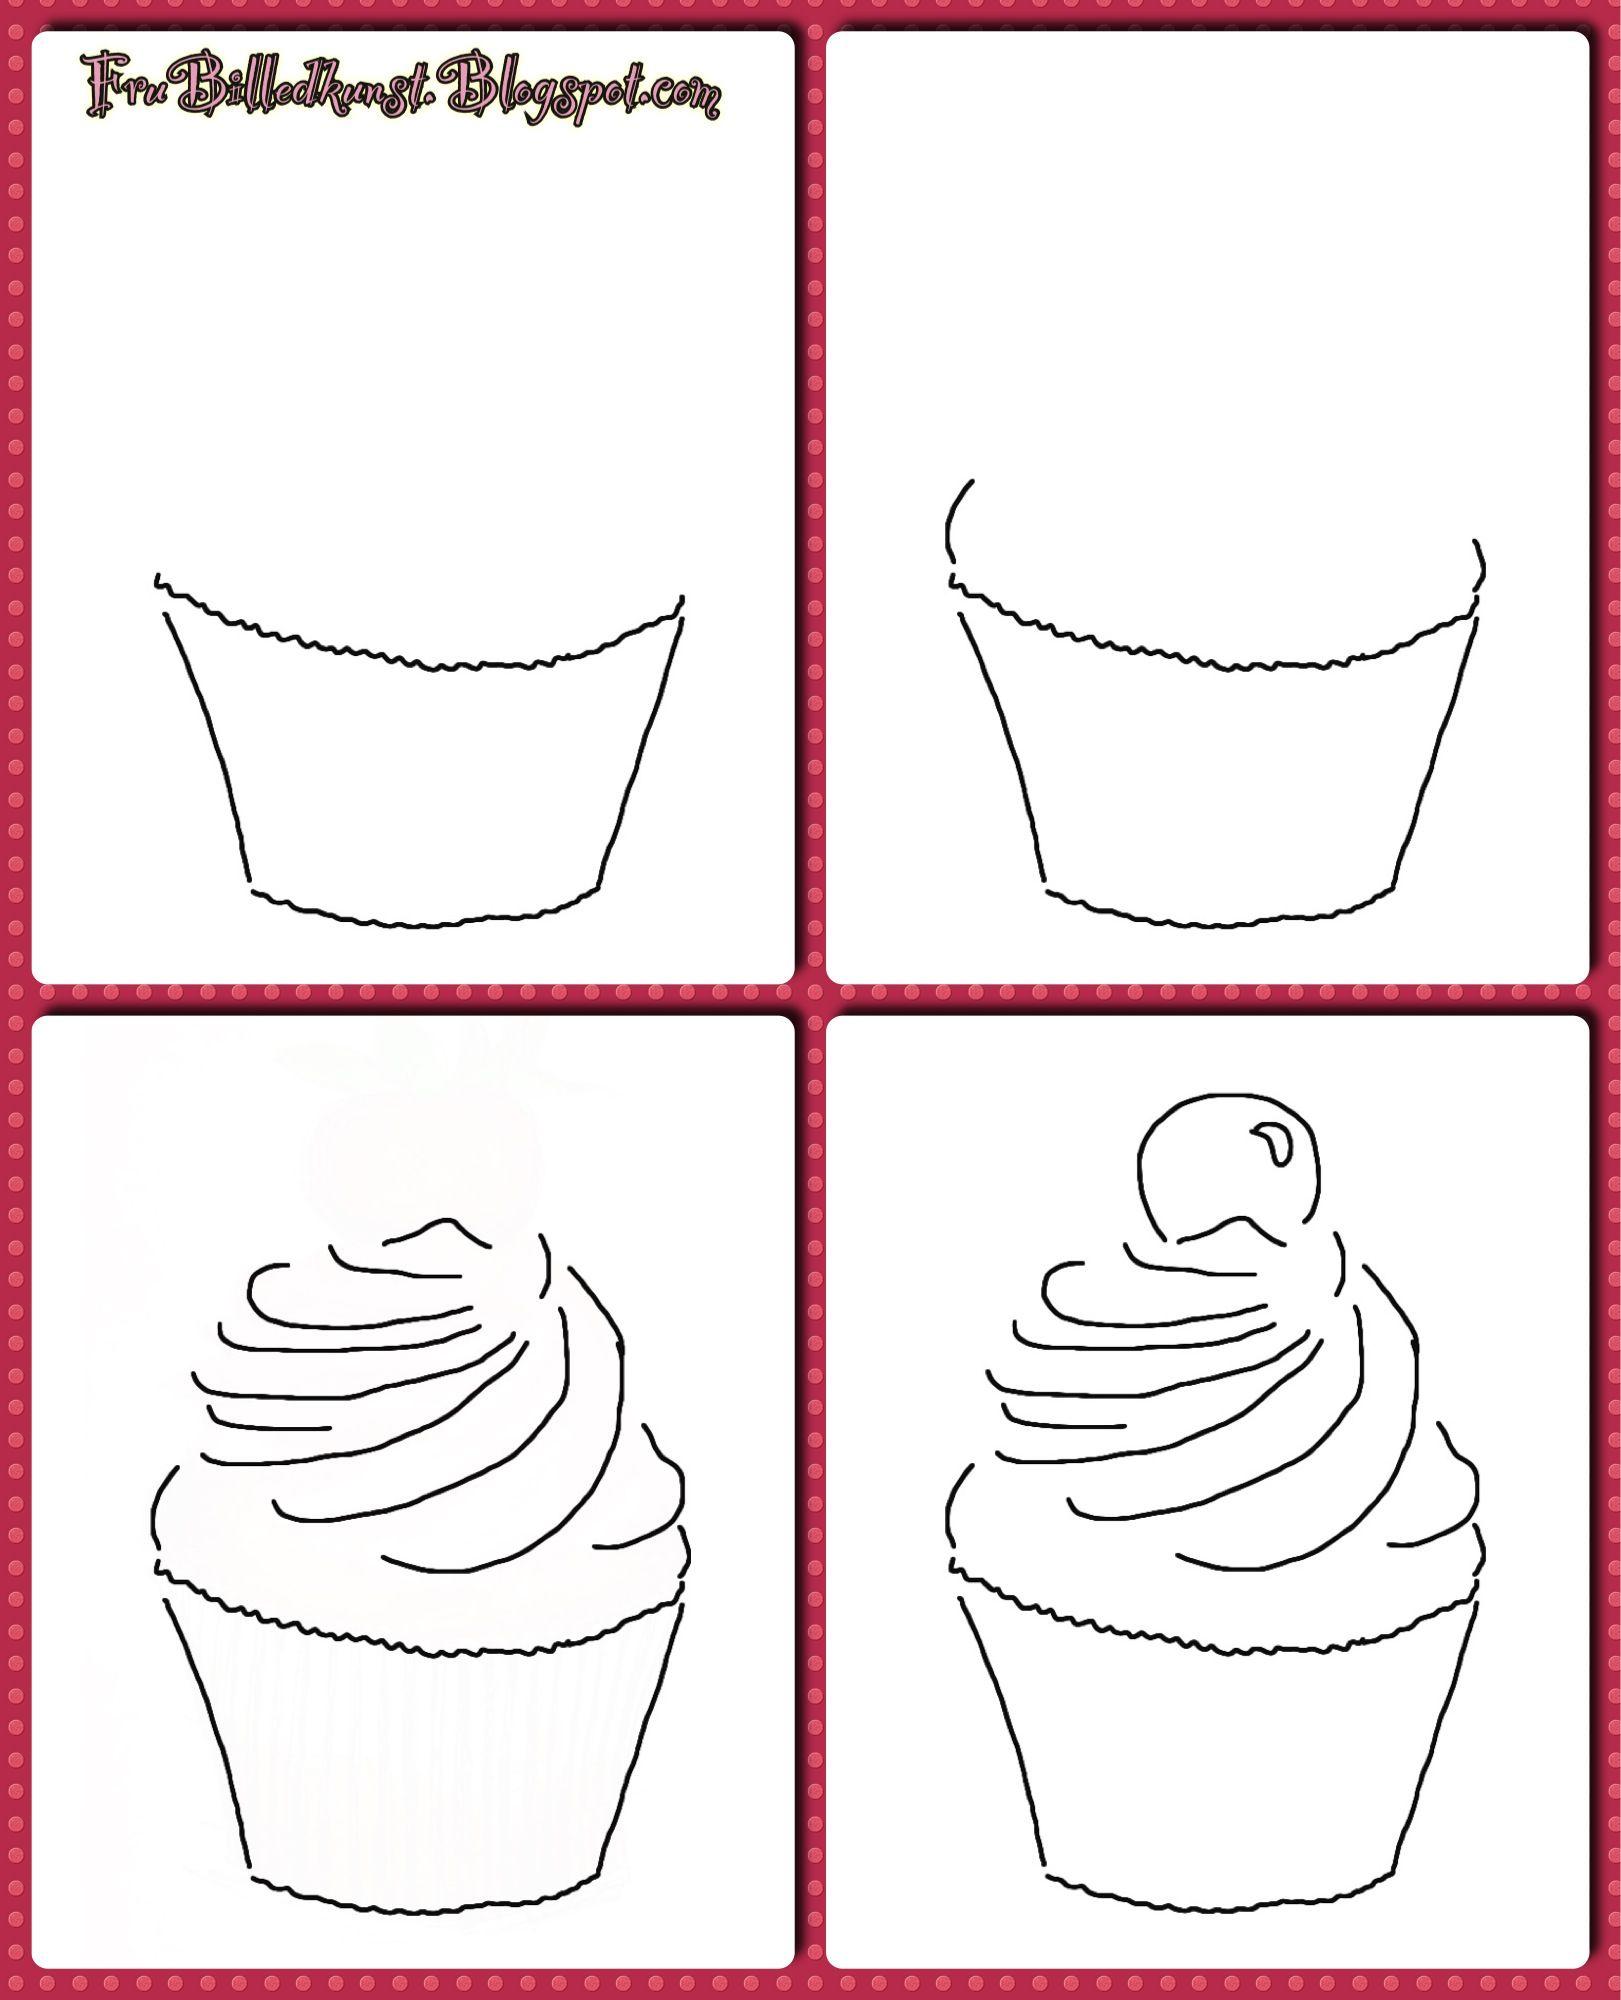 Cupcakes Inspiration Fra Thiebaud Del 3